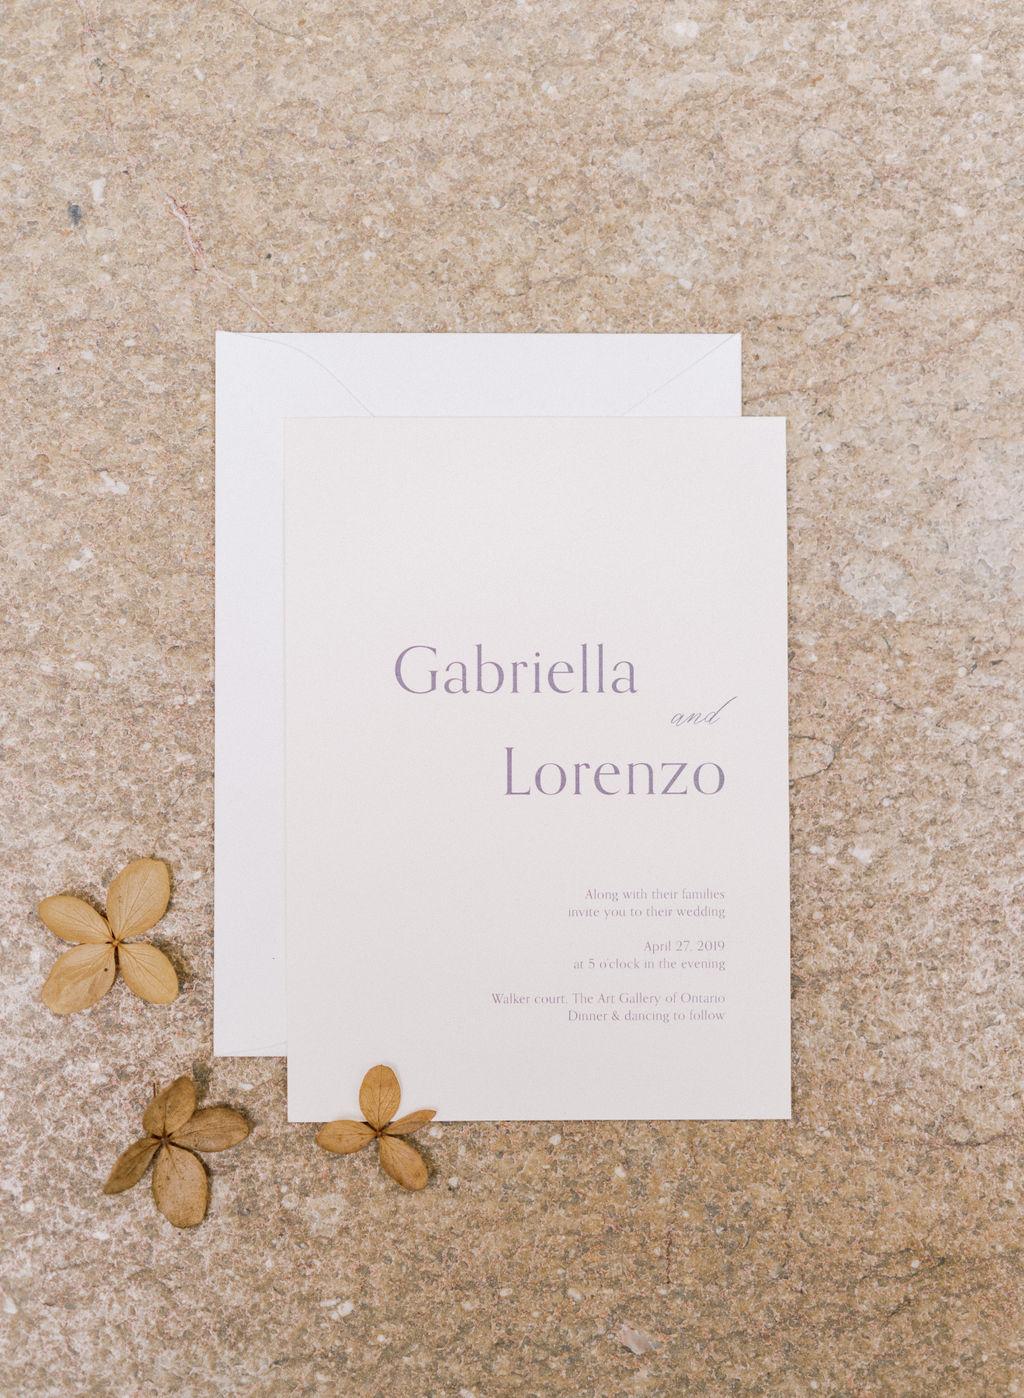 artiese-ago-wedding-editorial-06724.jpg